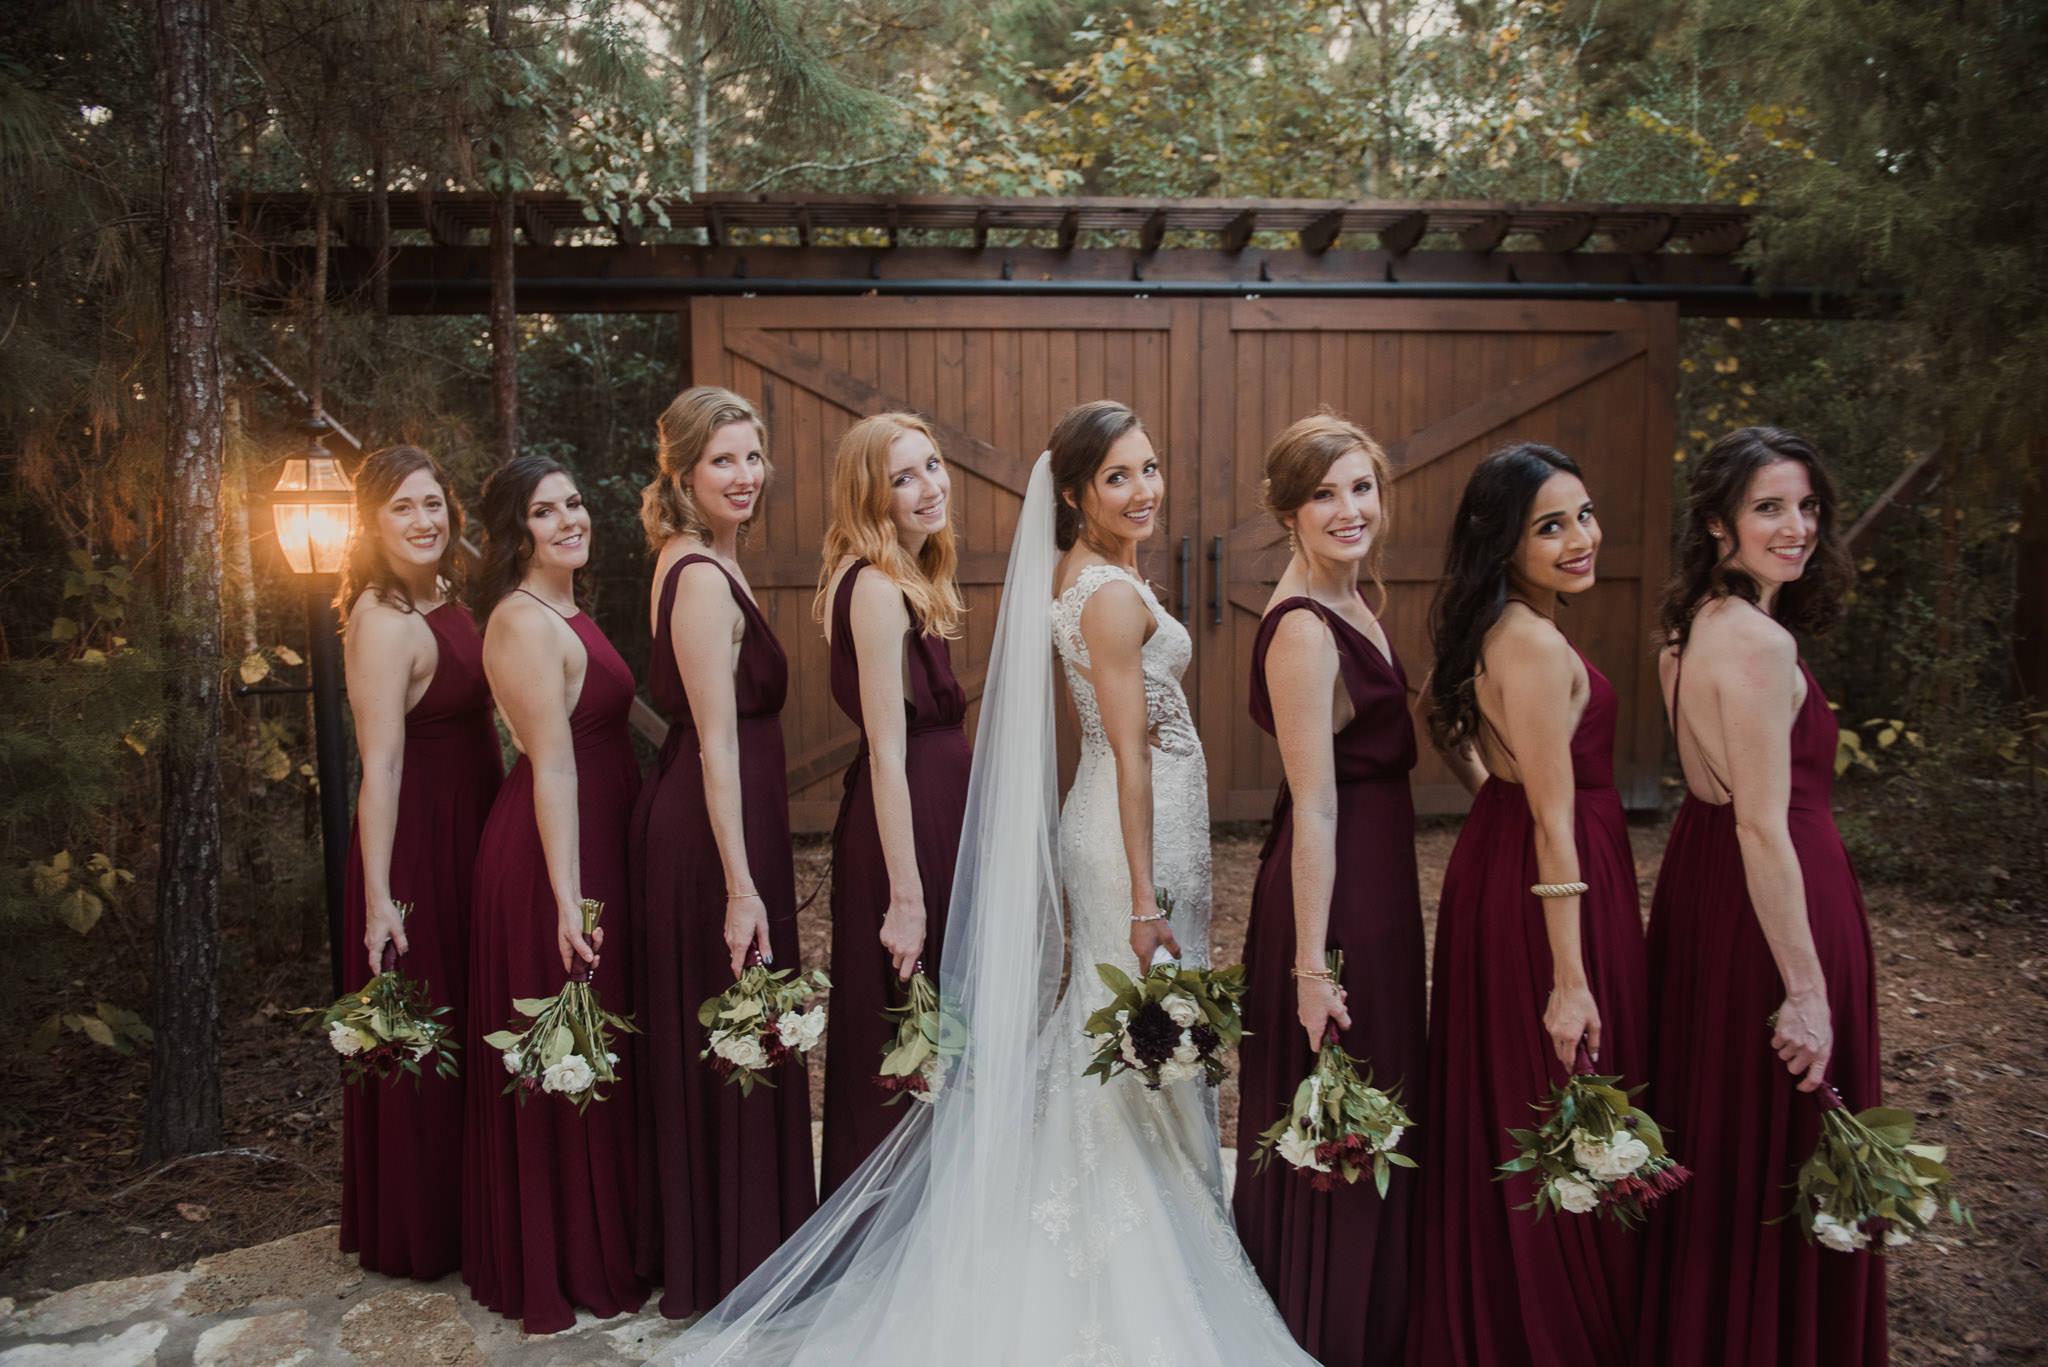 nichole-kyle-magnolia-bells-magnolia-wedding-sm-119.jpg